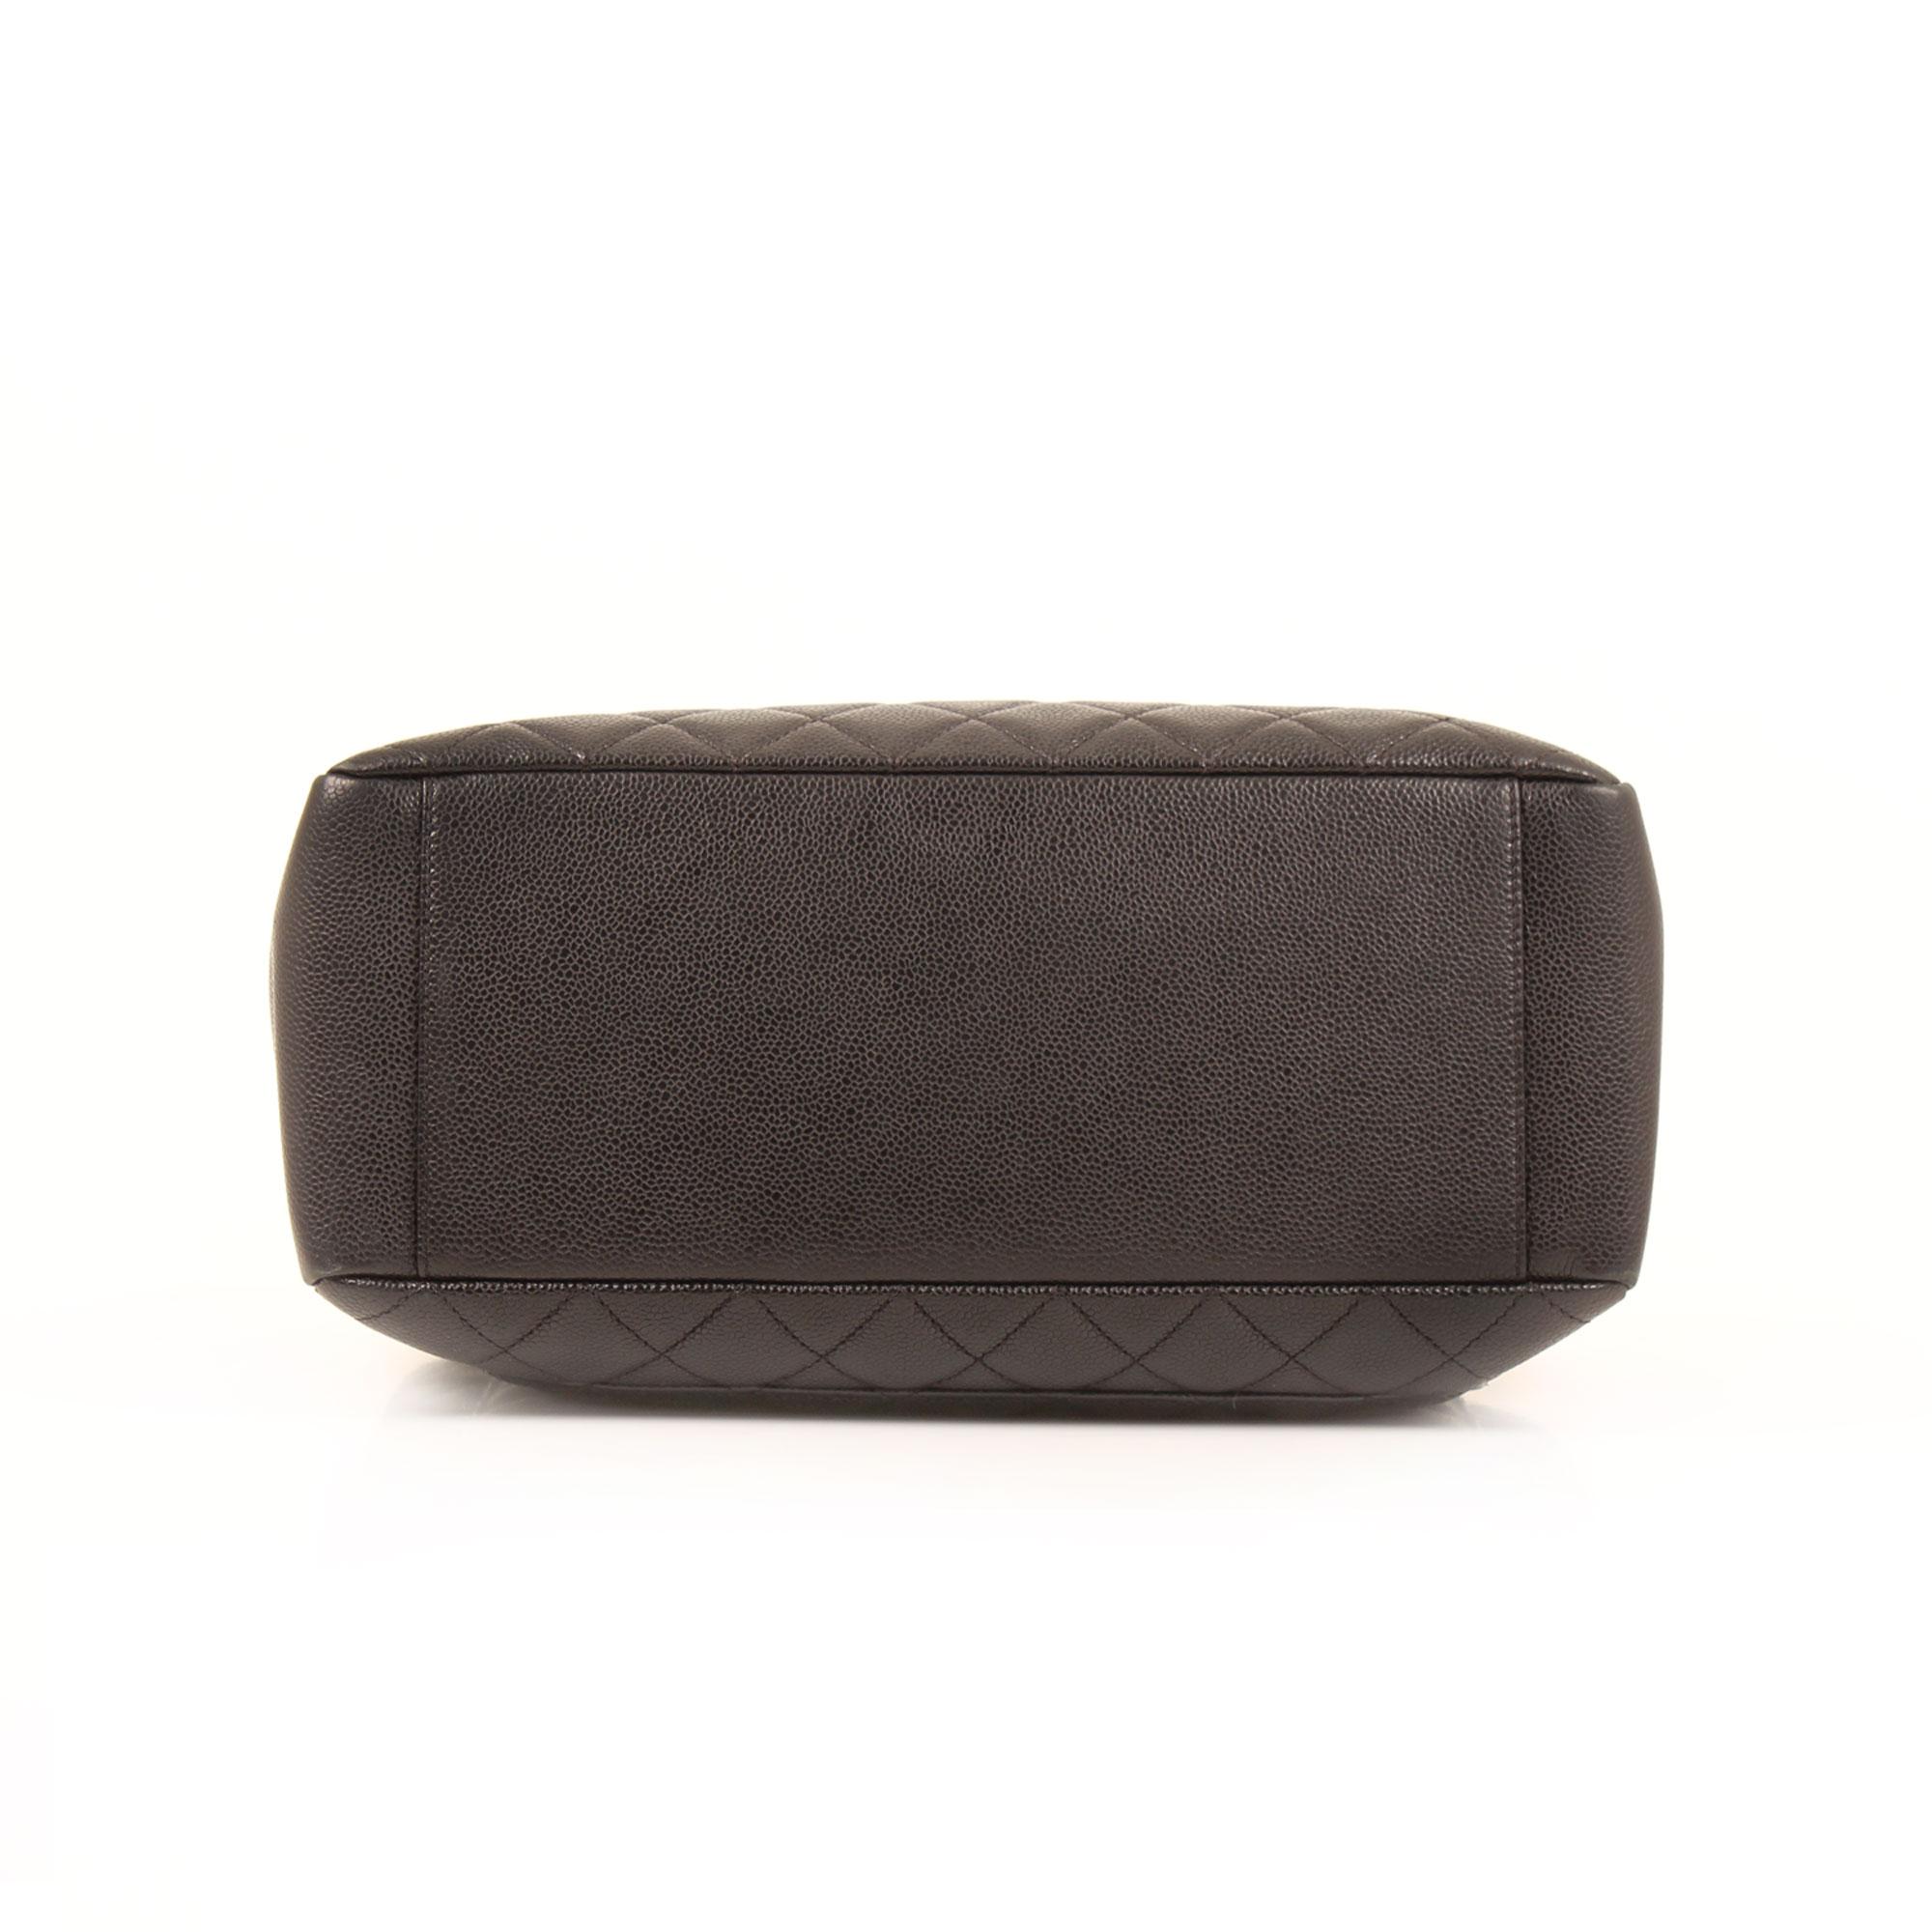 Base image of chanel grand shopping tote bag black caviar